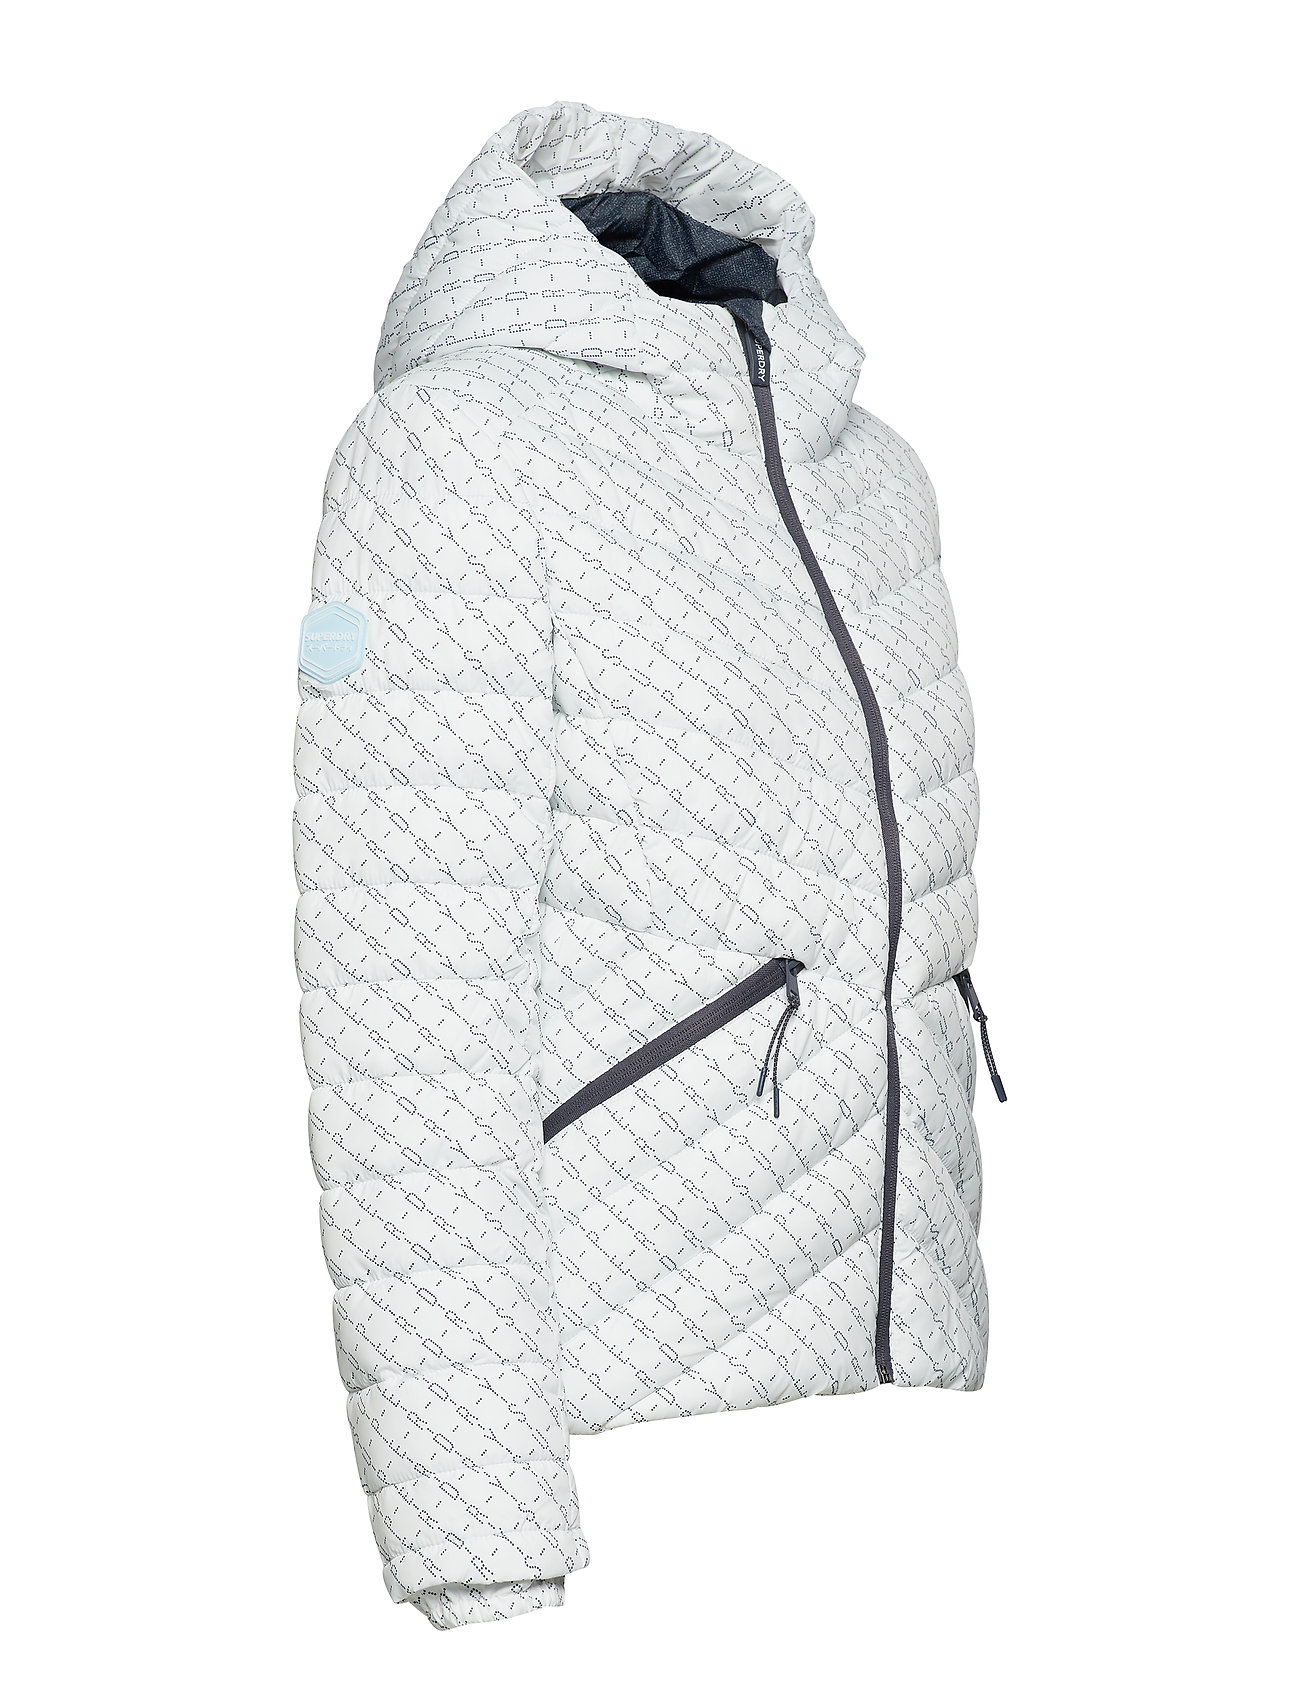 huge discount 4a7ed 6952b 30% Sale Helio Fuji Hooded Jacket Gefütterte Jacke Grau ...